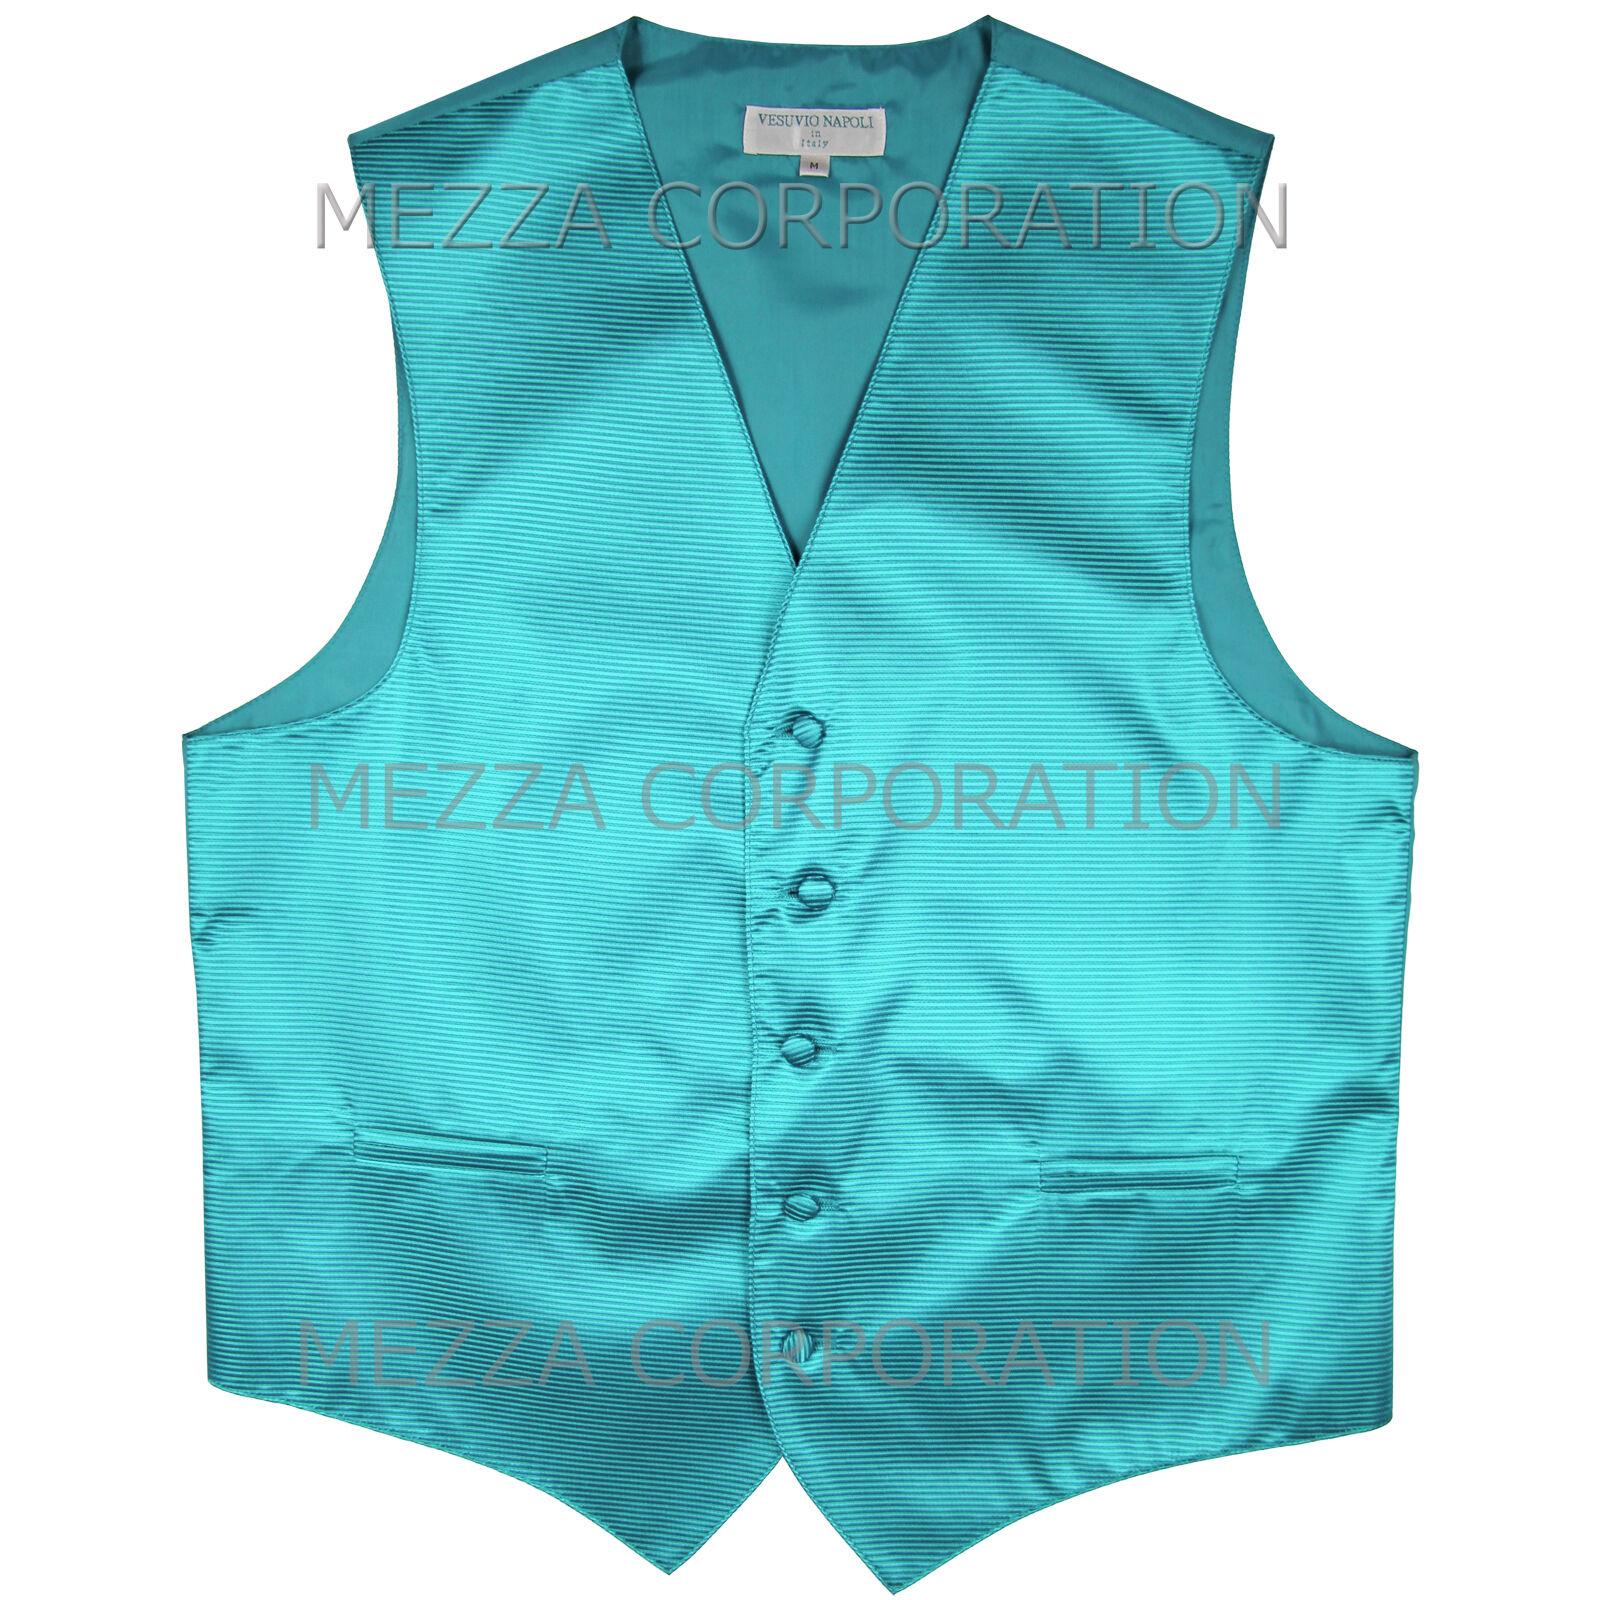 New Men's Tuxedo Vest Waistcoat Horizontal Stripes only prom party Turquoise